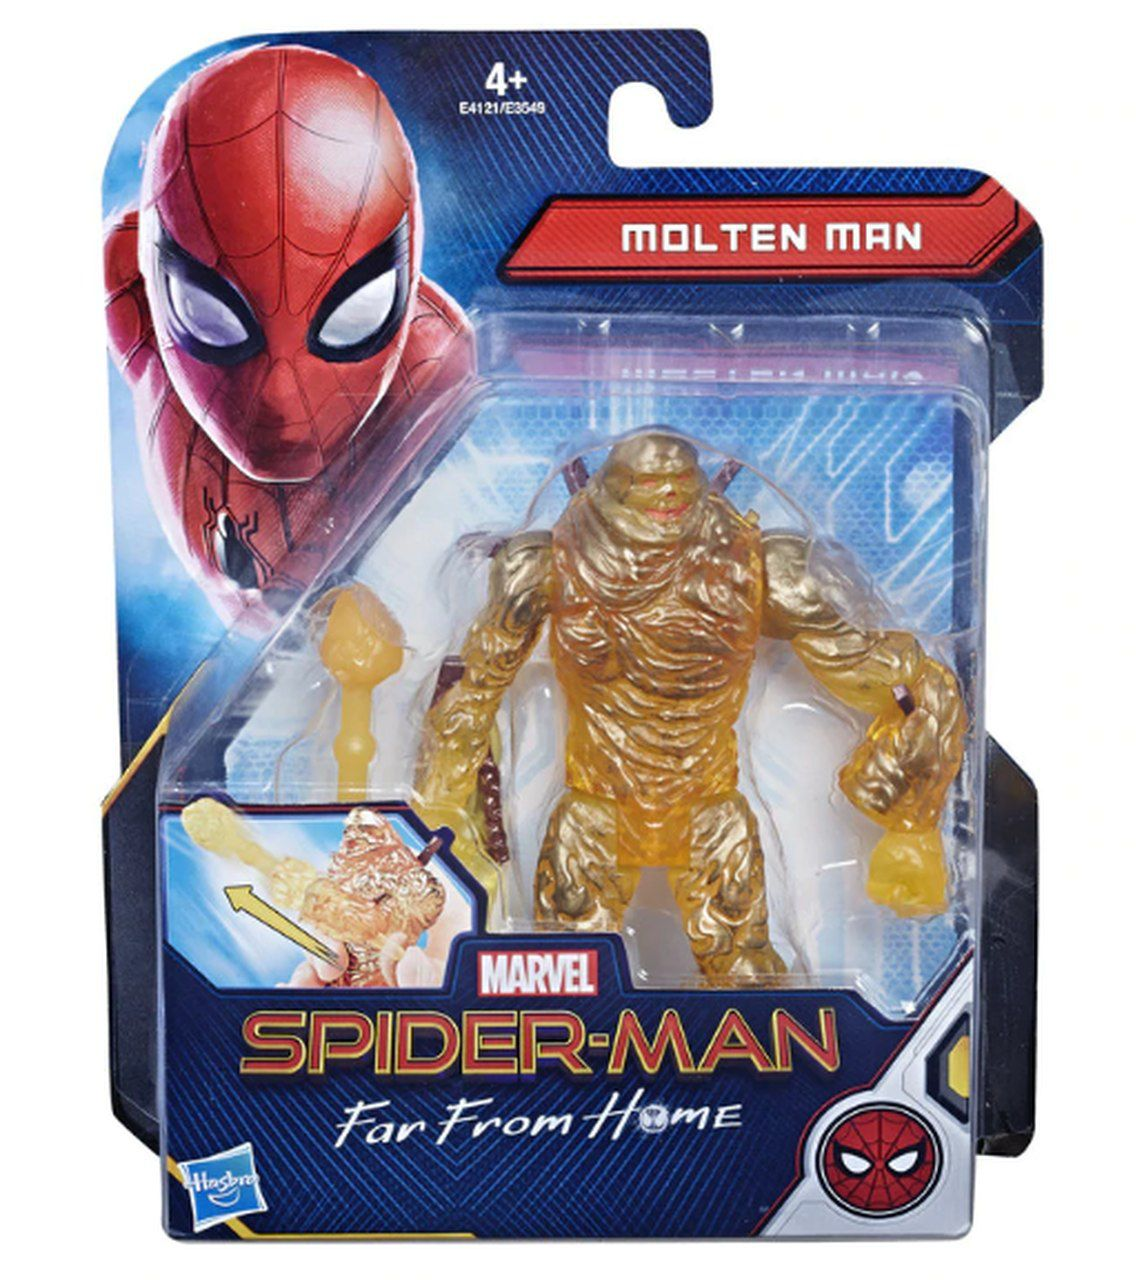 Action Figure Magma (Molten Man) 6'':Longe De Casa (Spider-Man Far From Home) Boneco Colecionável - Hasbro